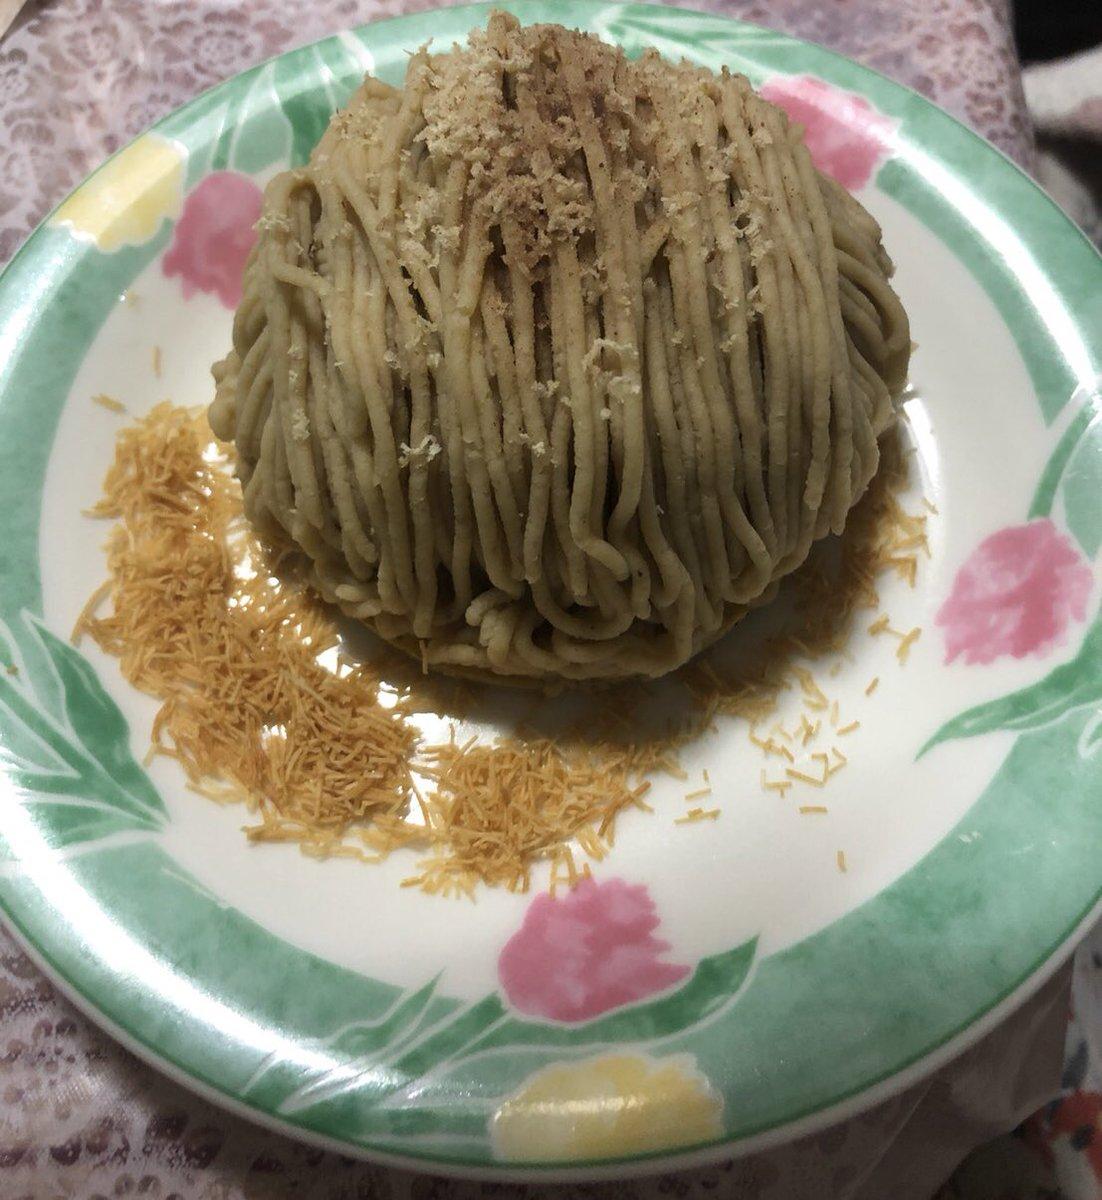 test ツイッターメディア - 京焼きぐり 比沙家さんの モンブラン✨ 中に抹茶のムース入ってて 甘すぎず最後まで美味しく頂きました。 https://t.co/JjD7UJUnqY